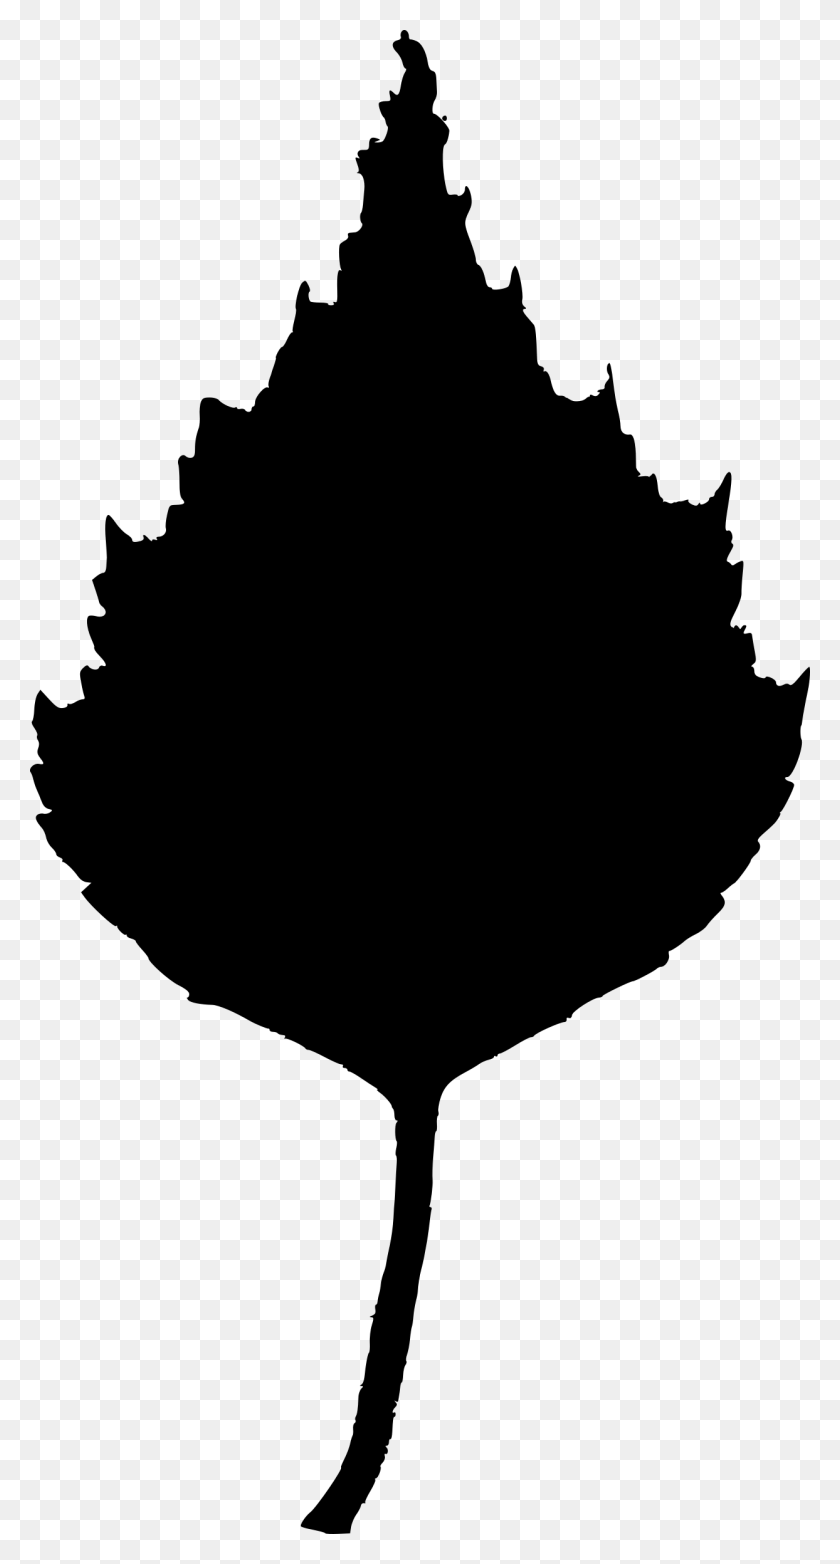 Leaf Clip Art Silhouette - Silver Snowflake Clipart